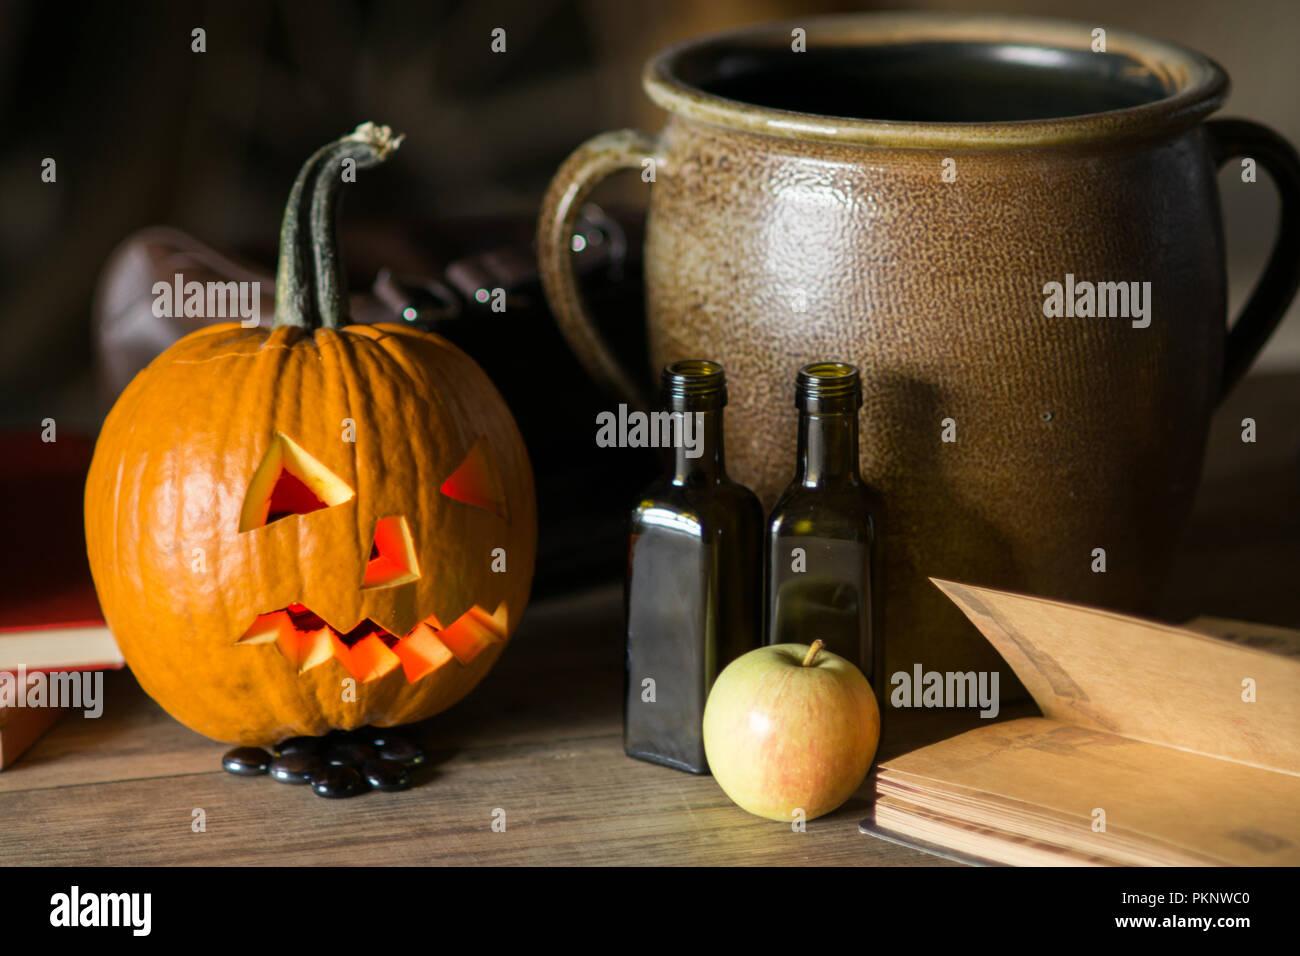 Awe Inspiring Decorations On Halloween Celebration With Pumpkin Face Pot Download Free Architecture Designs Rallybritishbridgeorg